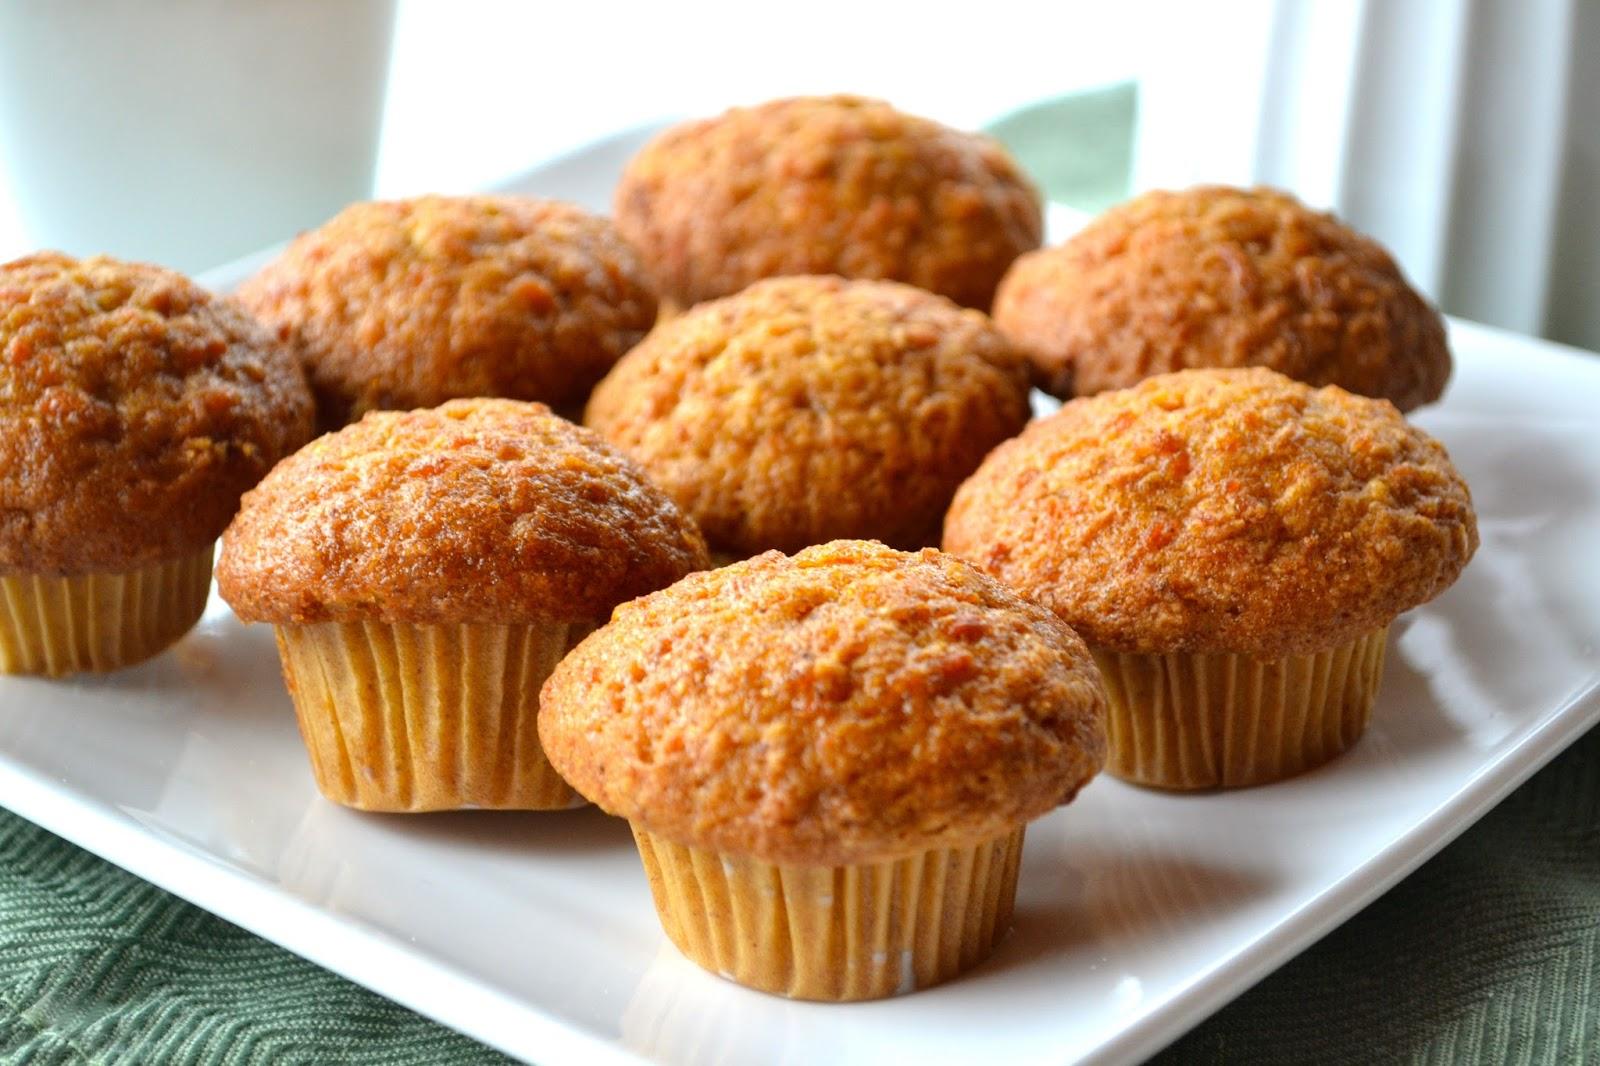 Paleo Carrot And Raisin Muffin Recipe